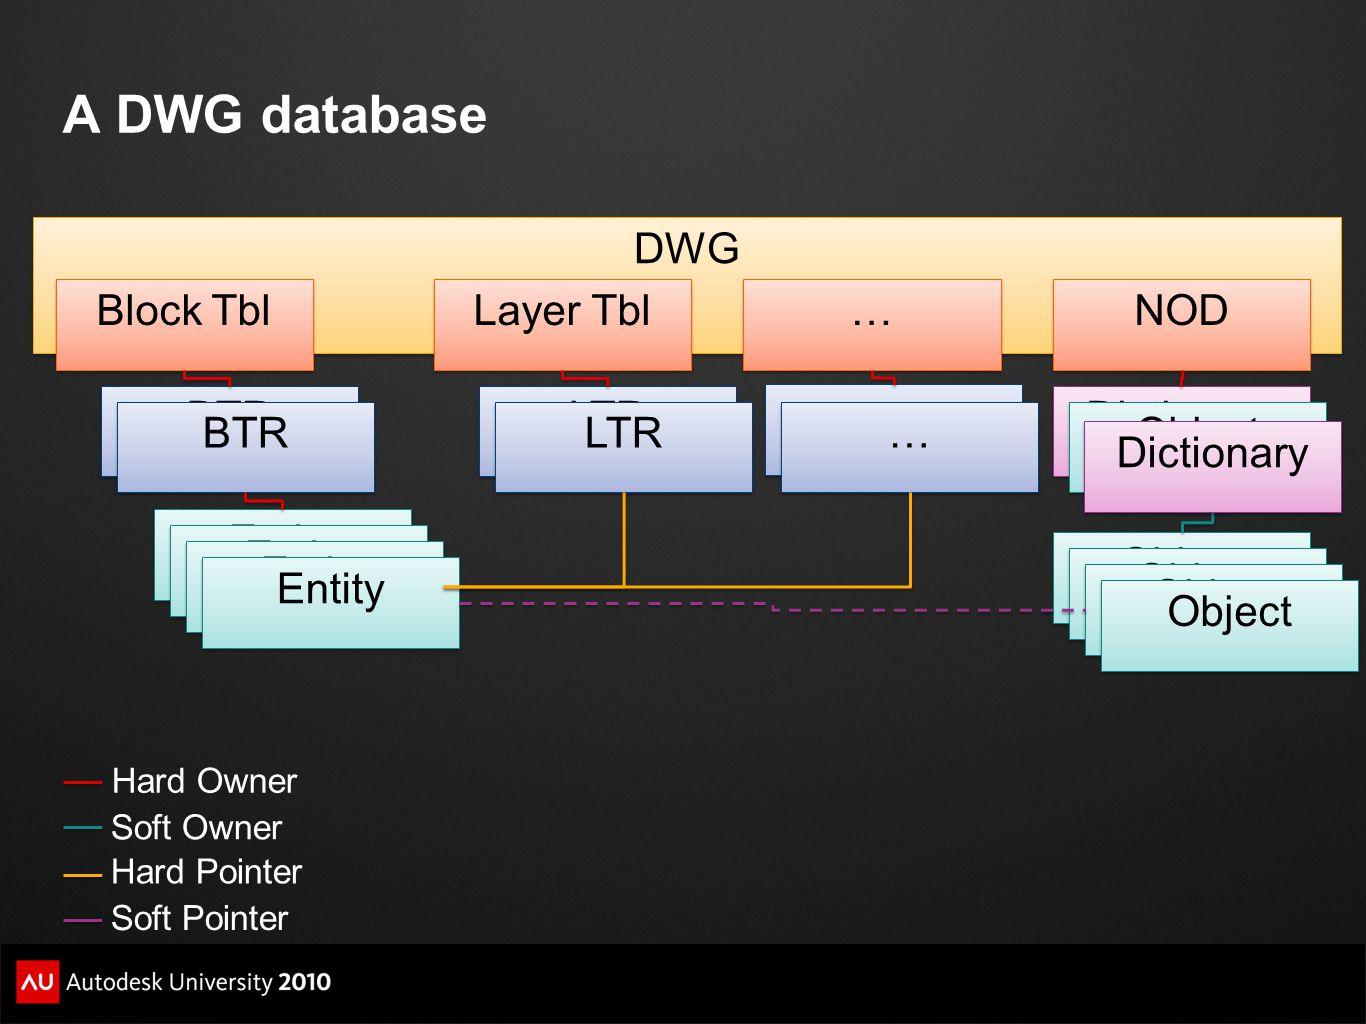 DWG Block Tbl BTR Layer Tbl LTR Entity … … NOD Dictionary Object BTR LTR Object Dictionary Hard Owner Soft Owner Soft Pointer Hard Pointer … … … … A D